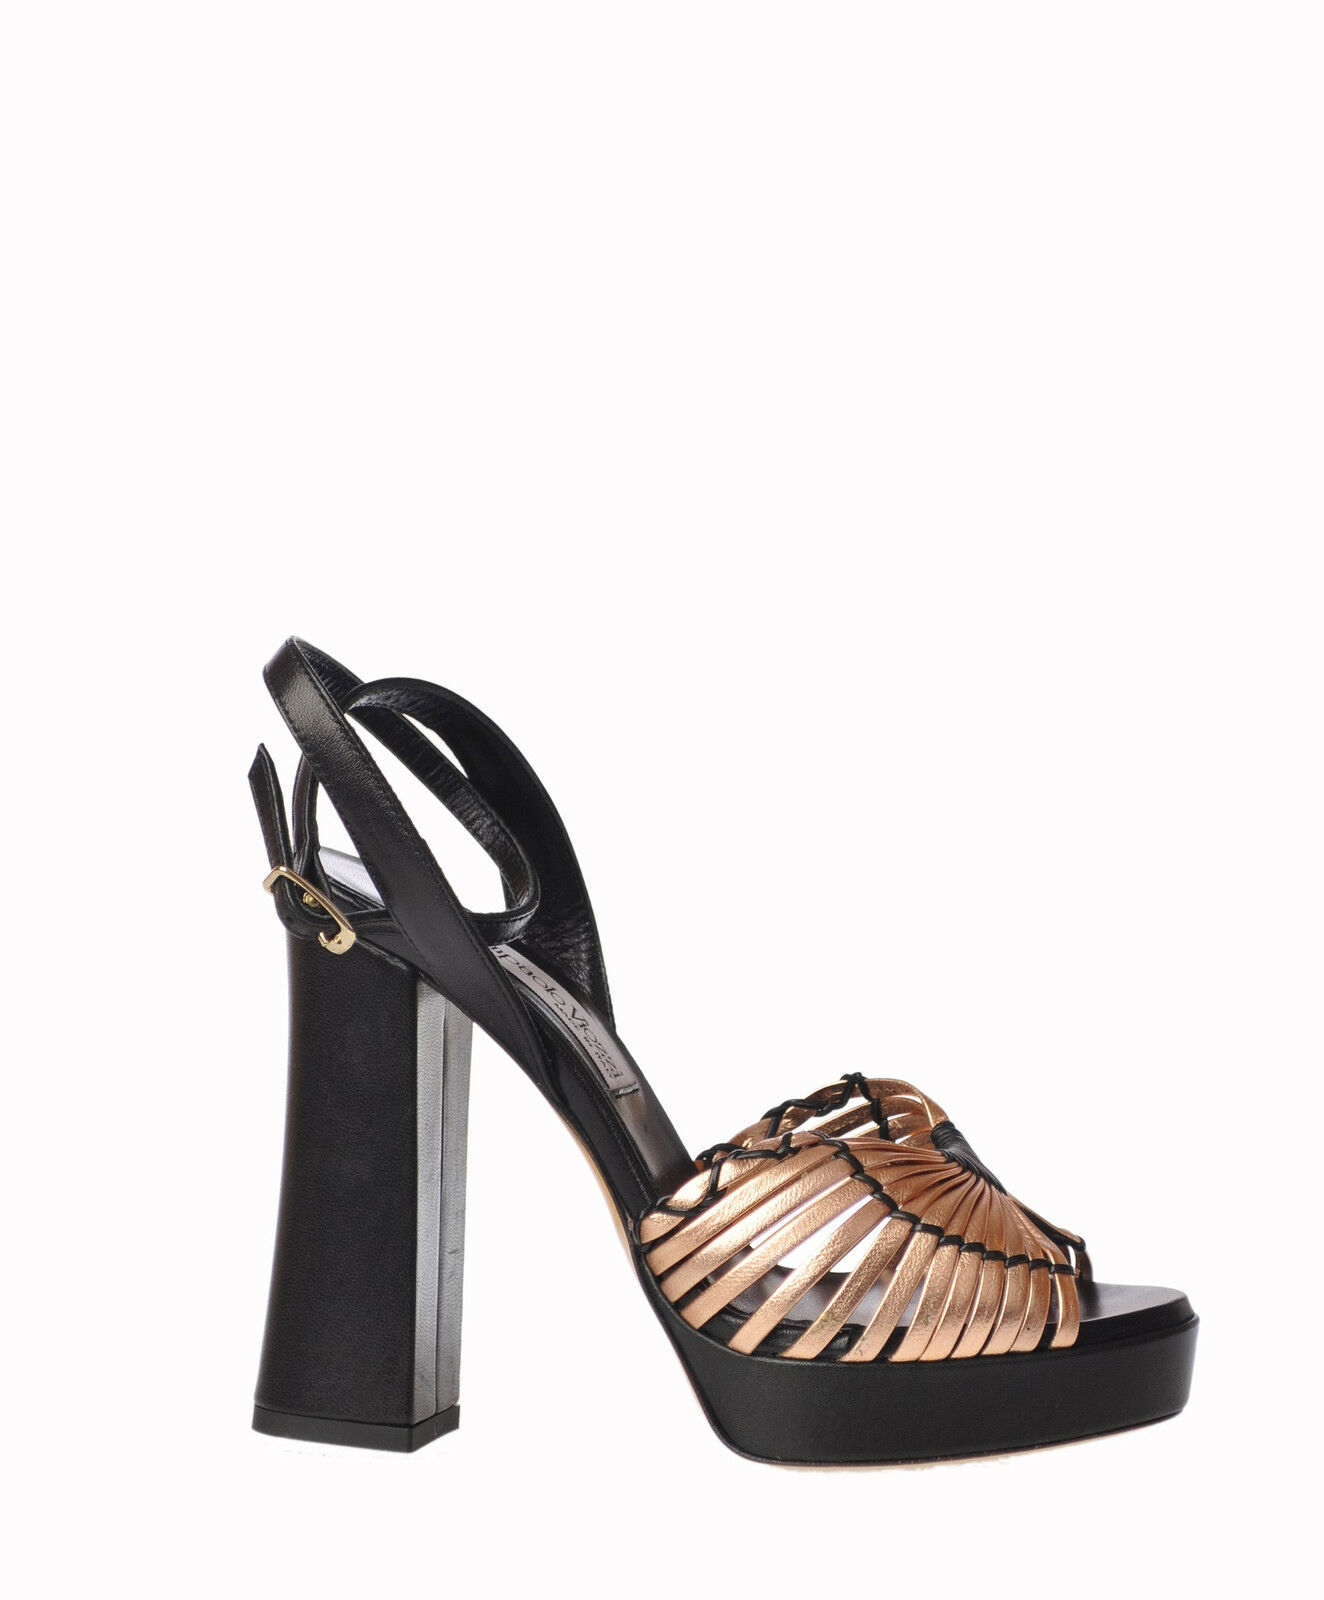 Le Viozzi  -  Schuhe - Weiblich - Schwarz - 3693626A184219